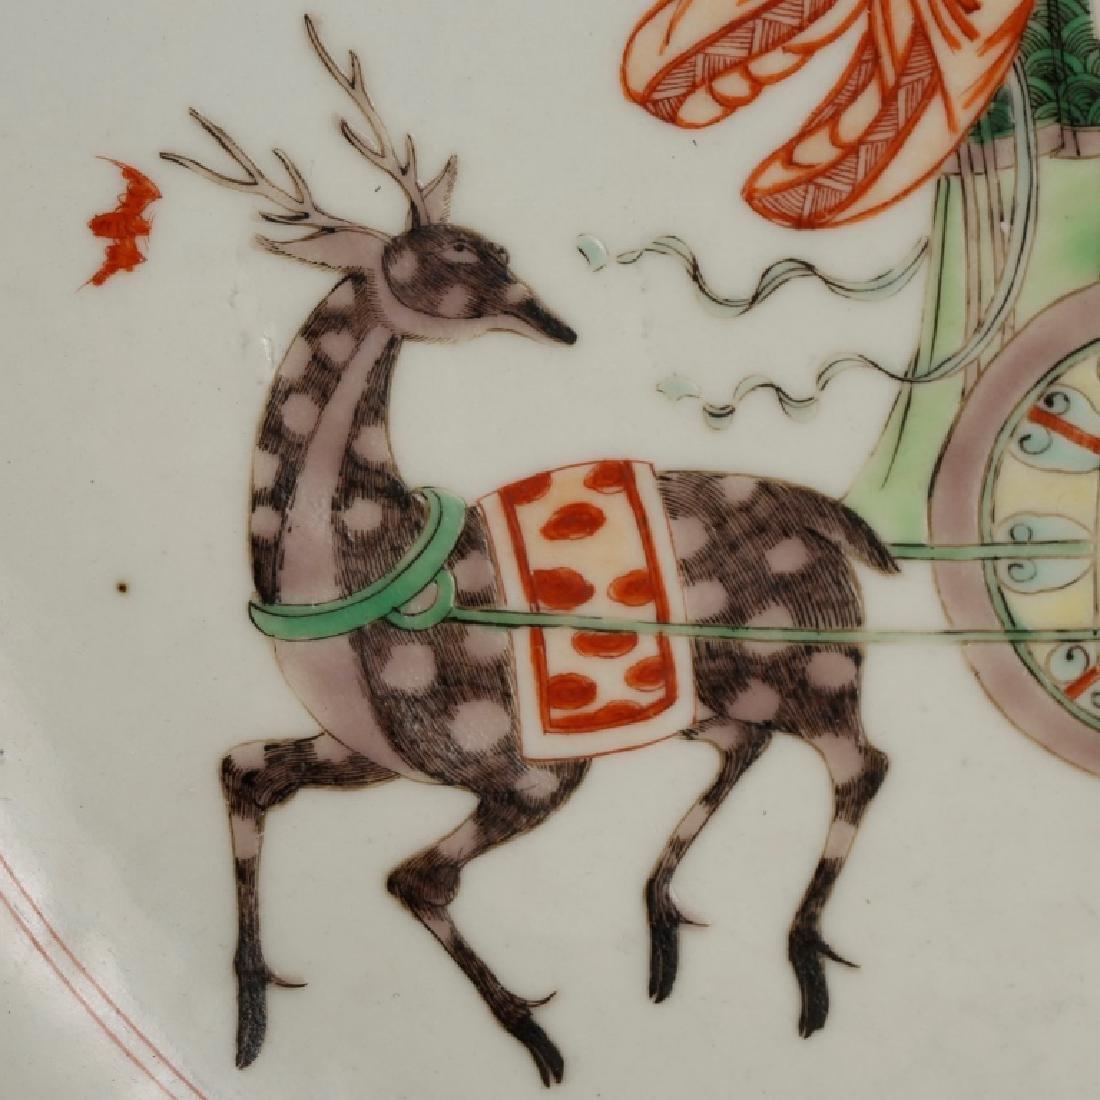 Chinese Qing Porcelain Famille Verte Plate - 4